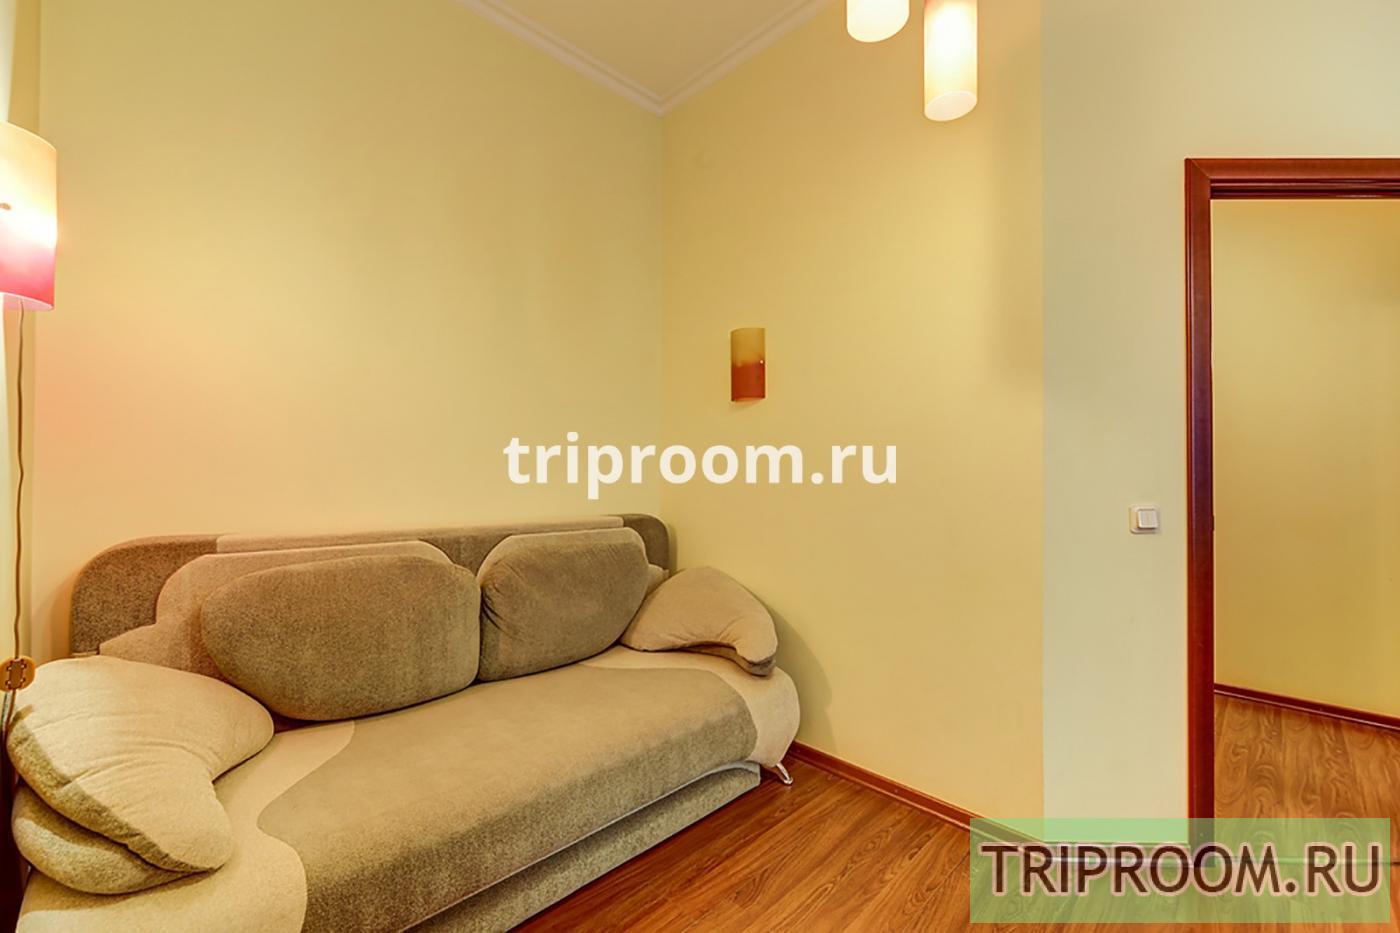 1-комнатная квартира посуточно (вариант № 15527), ул. Канала Грибоедова набережная, фото № 13